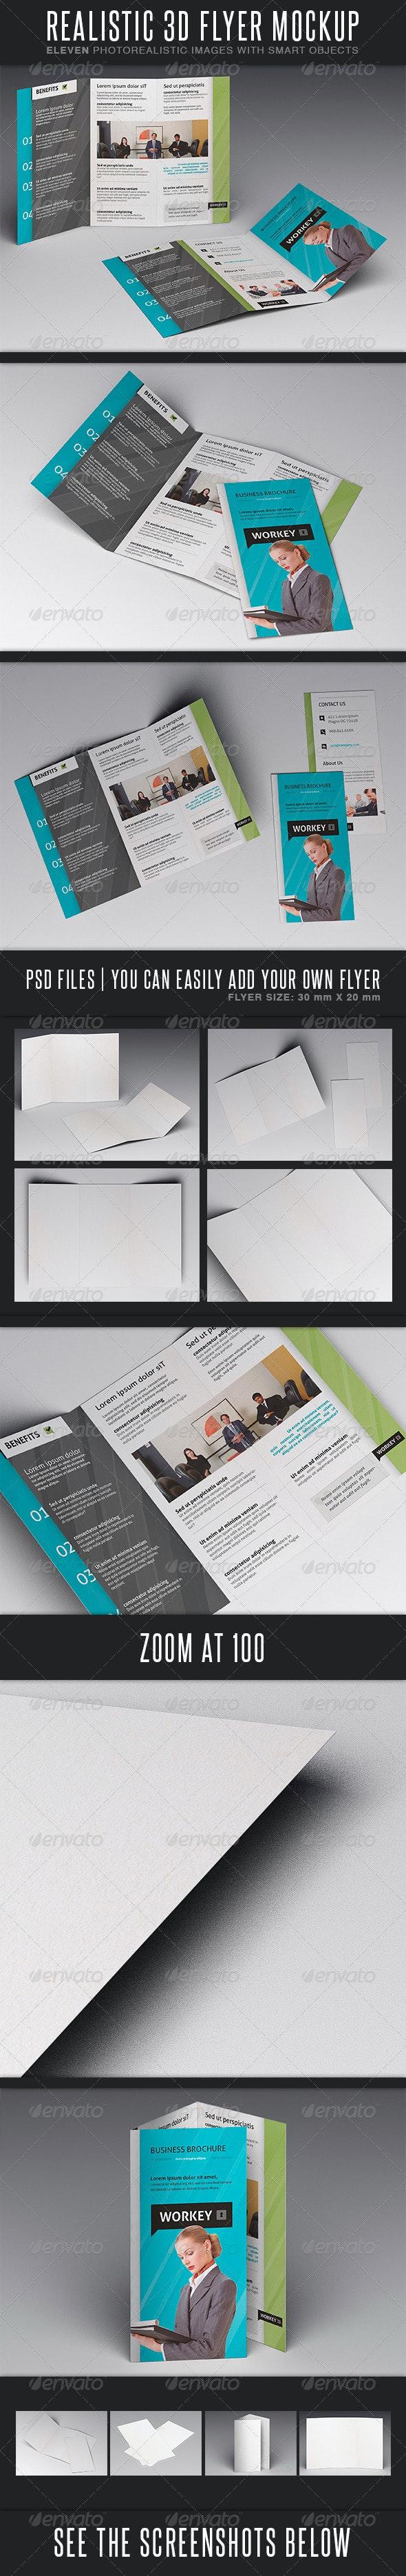 Realistic Flyer MockUp - Brochures Print